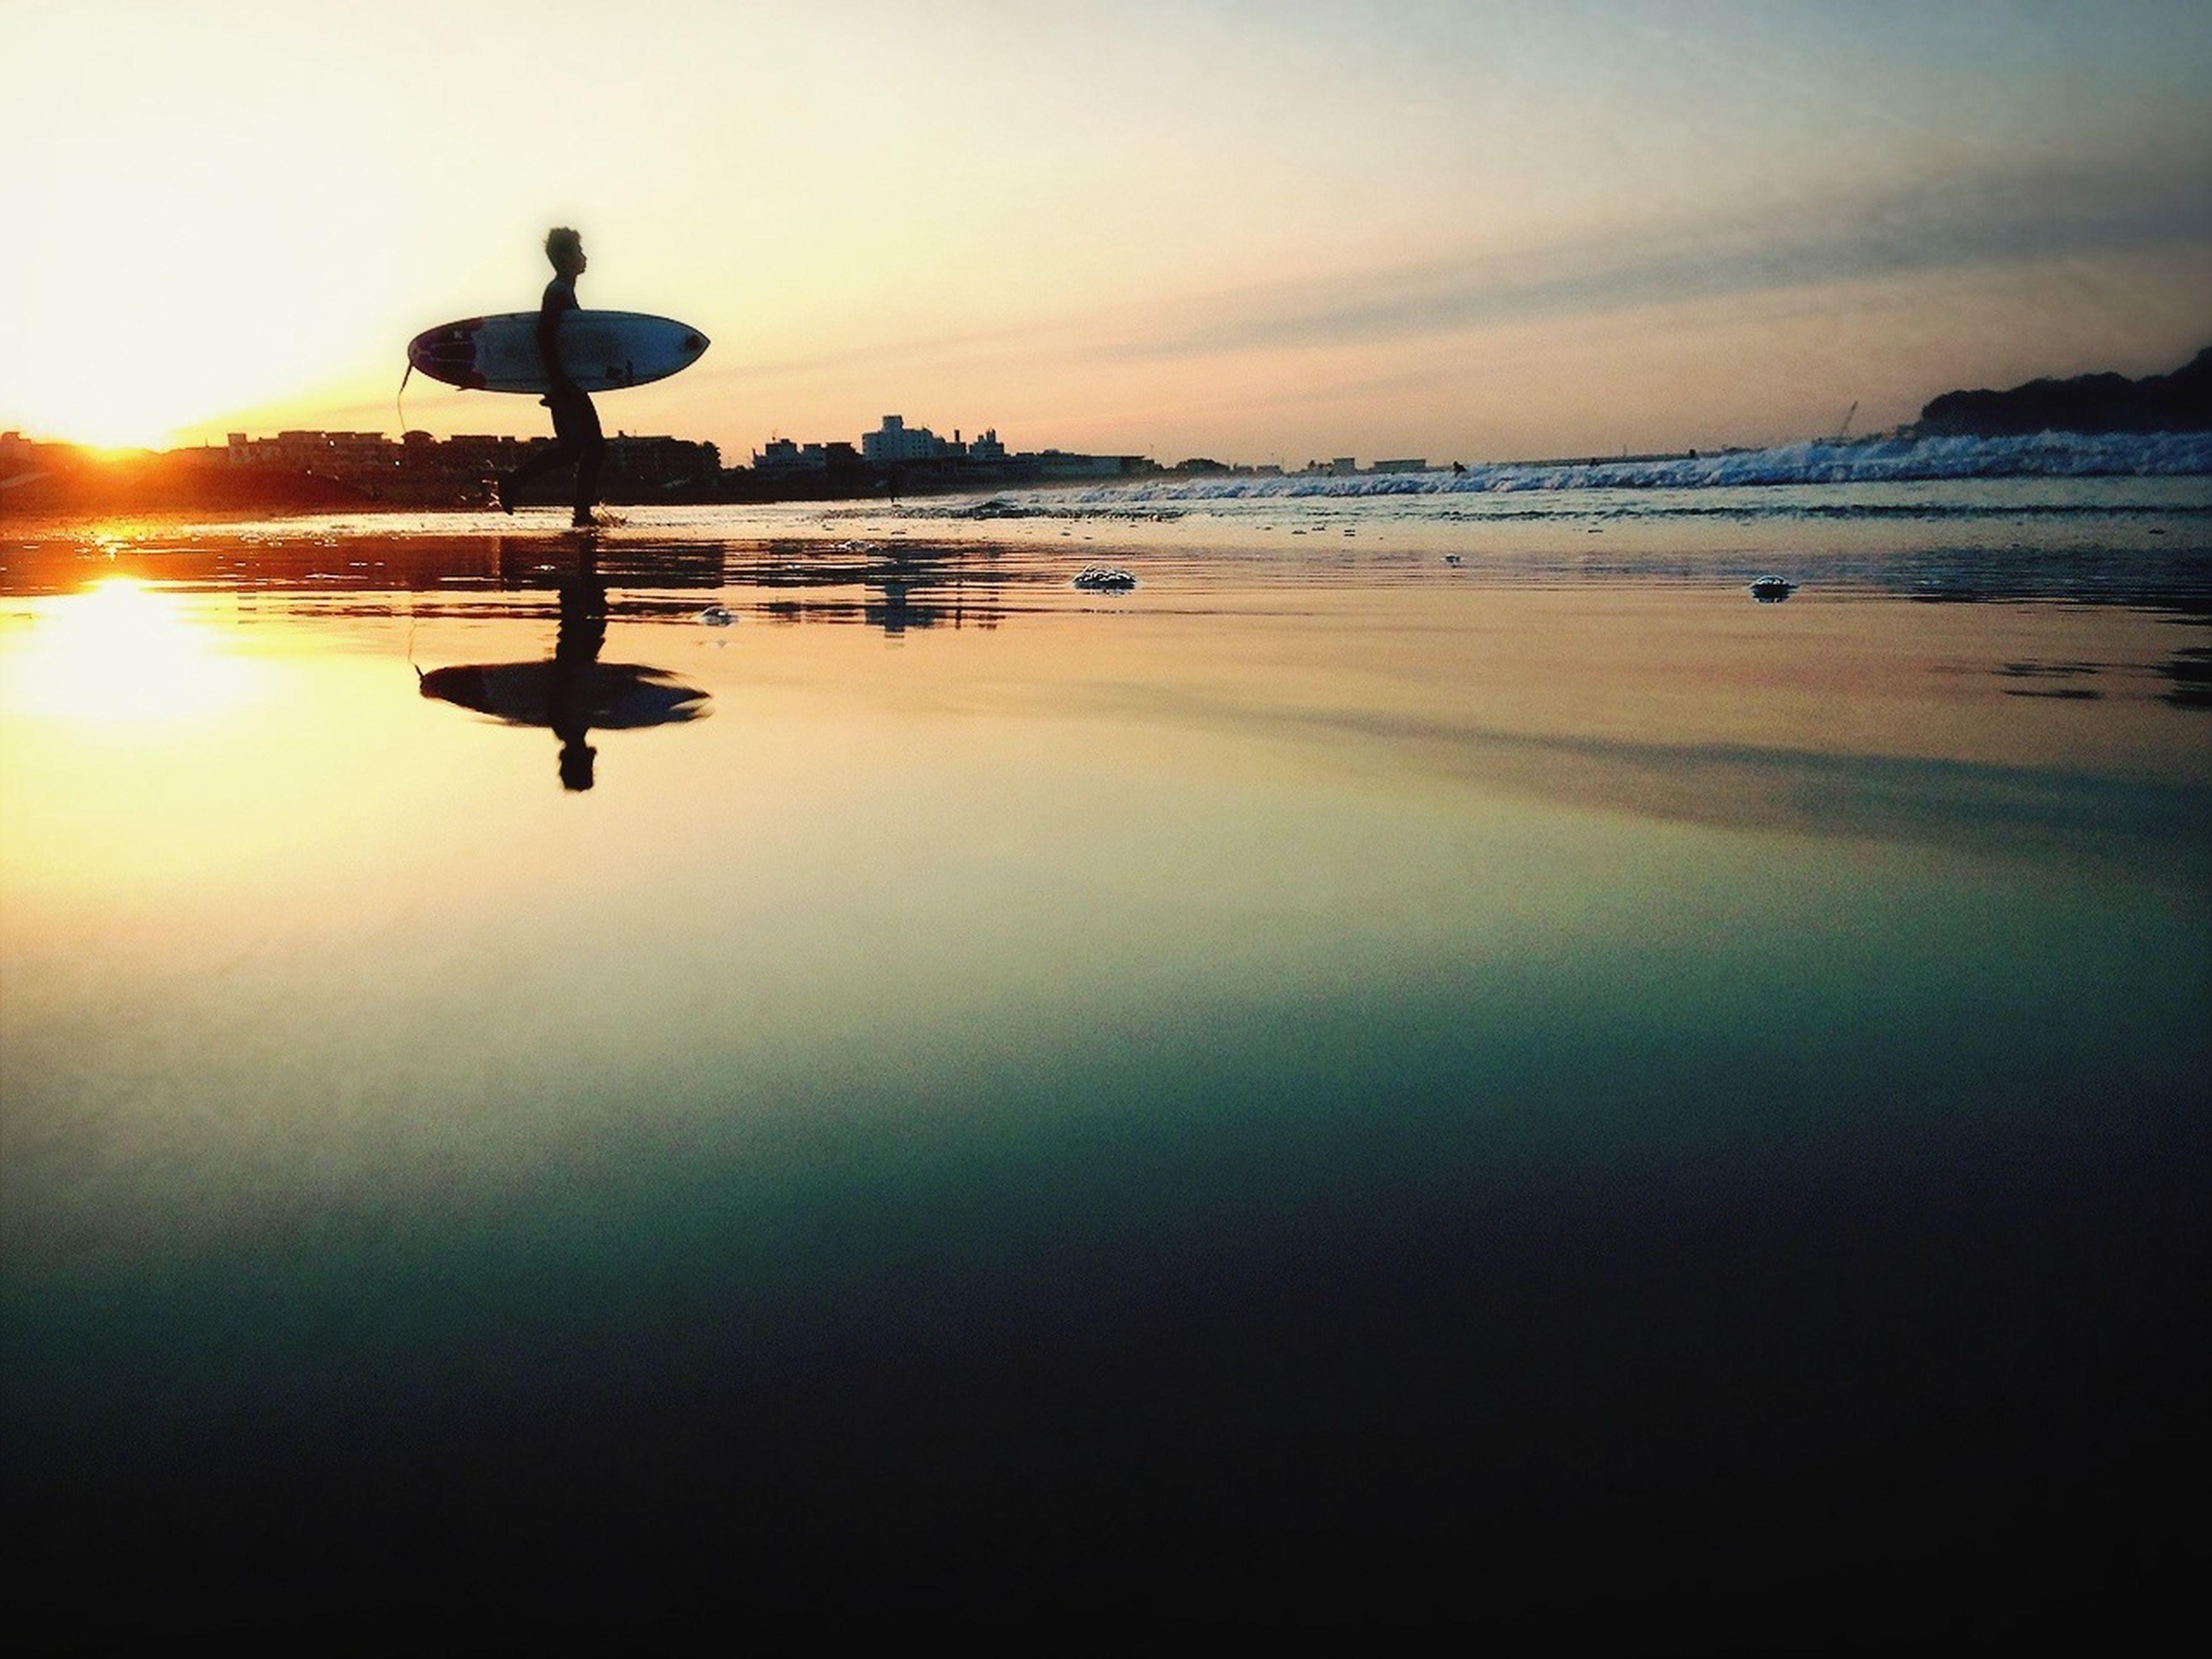 sunset, water, sea, sky, silhouette, sun, scenics, tranquility, tranquil scene, beauty in nature, horizon over water, reflection, idyllic, nature, orange color, beach, cloud - sky, street light, shore, sunlight